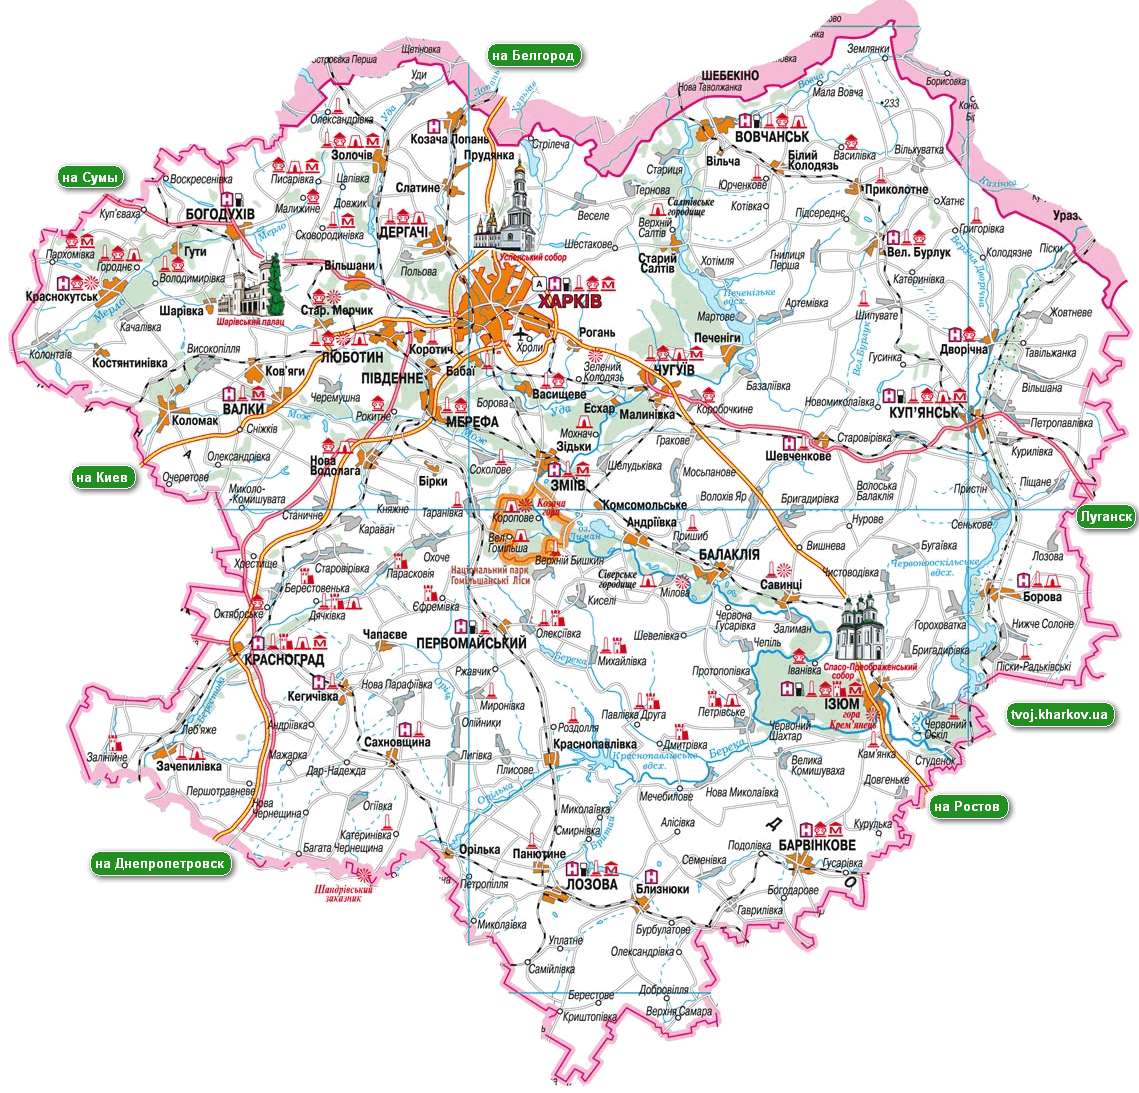 Харьков - Карта Харьковской области: http://tvoj.kharkov.ua/map/mapa.php?r=3